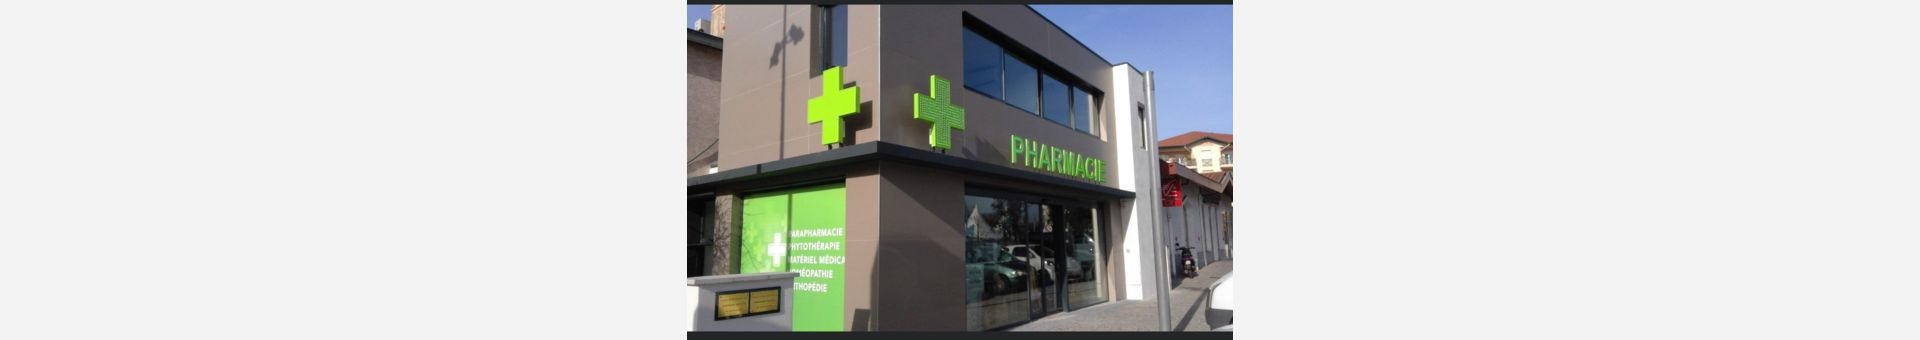 Pharmacie des Cinq Cantons,Anglet